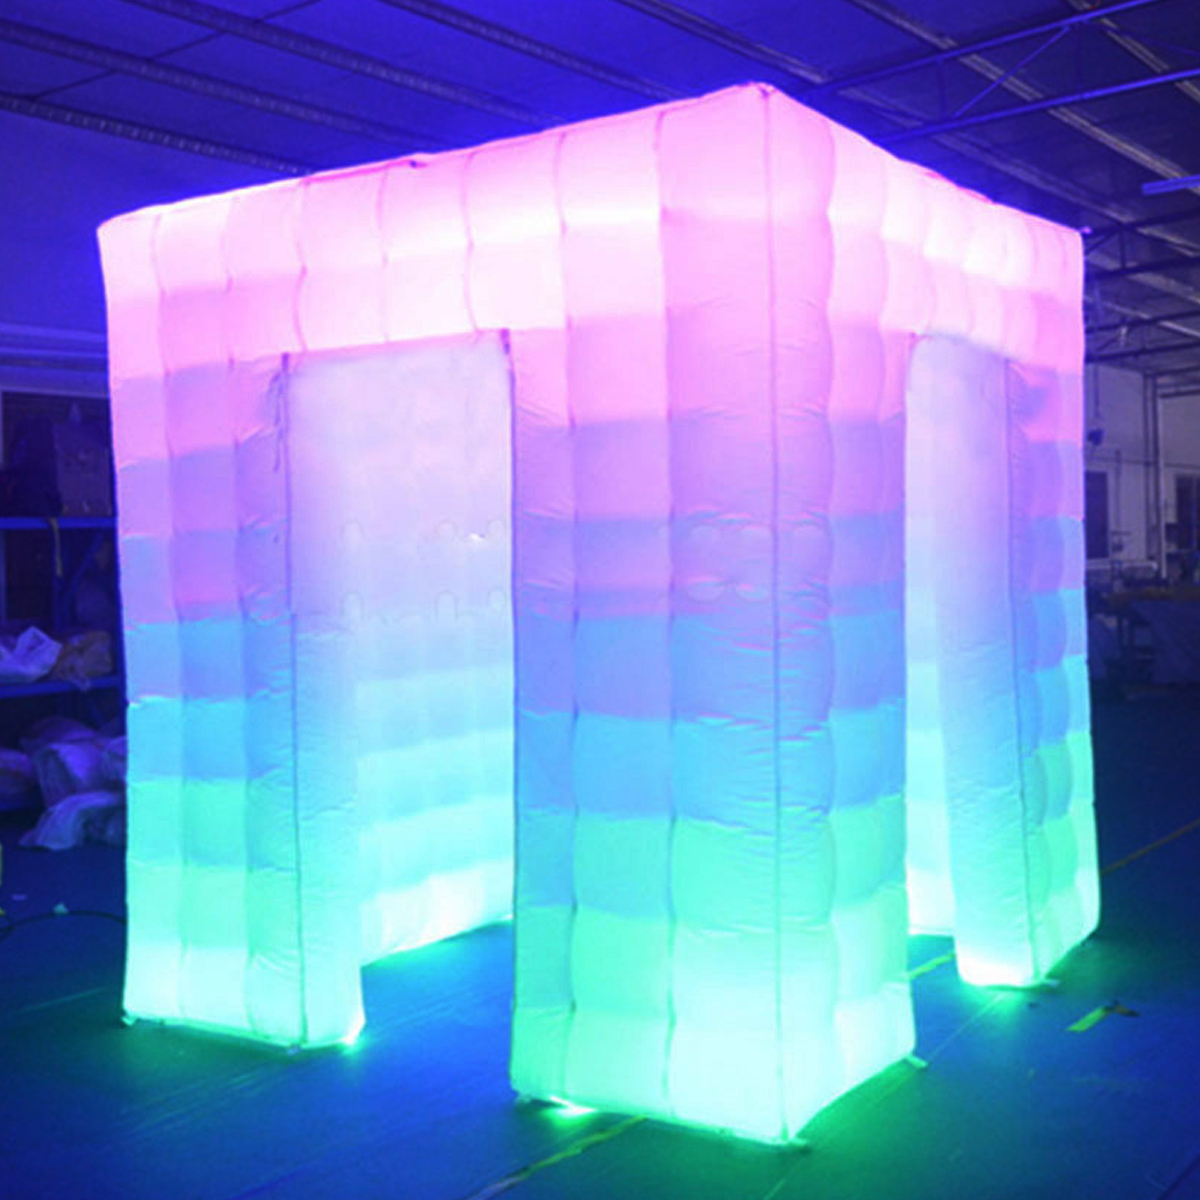 Cabine Photo gonflable Cube gonflable tente 2 porte LED couleur ampoule bande gonflable Photo photographie cabine photographie Cube